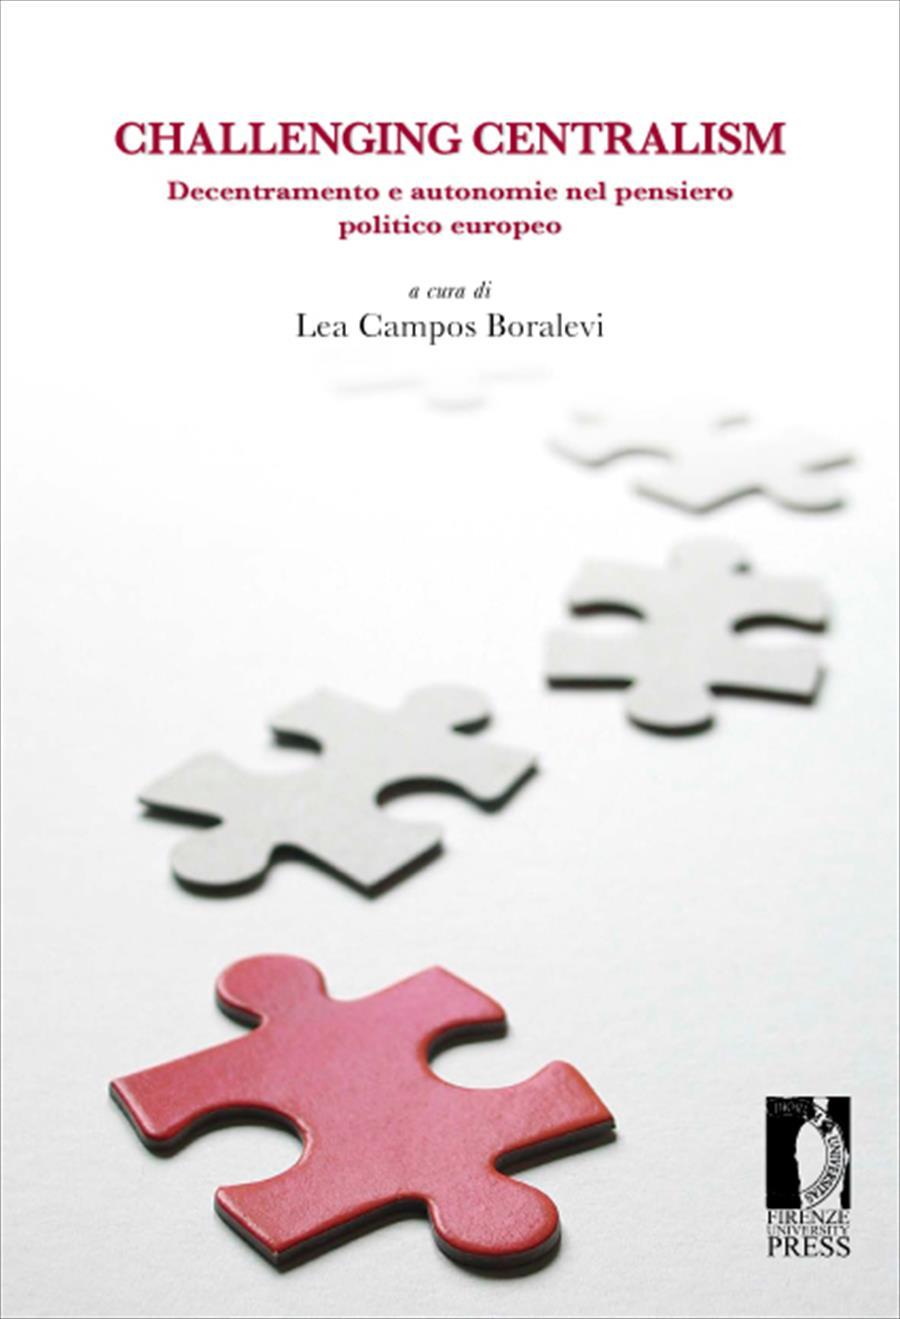 Challenging Centralism: Decentramento e autonomie nel pensiero politico europeo